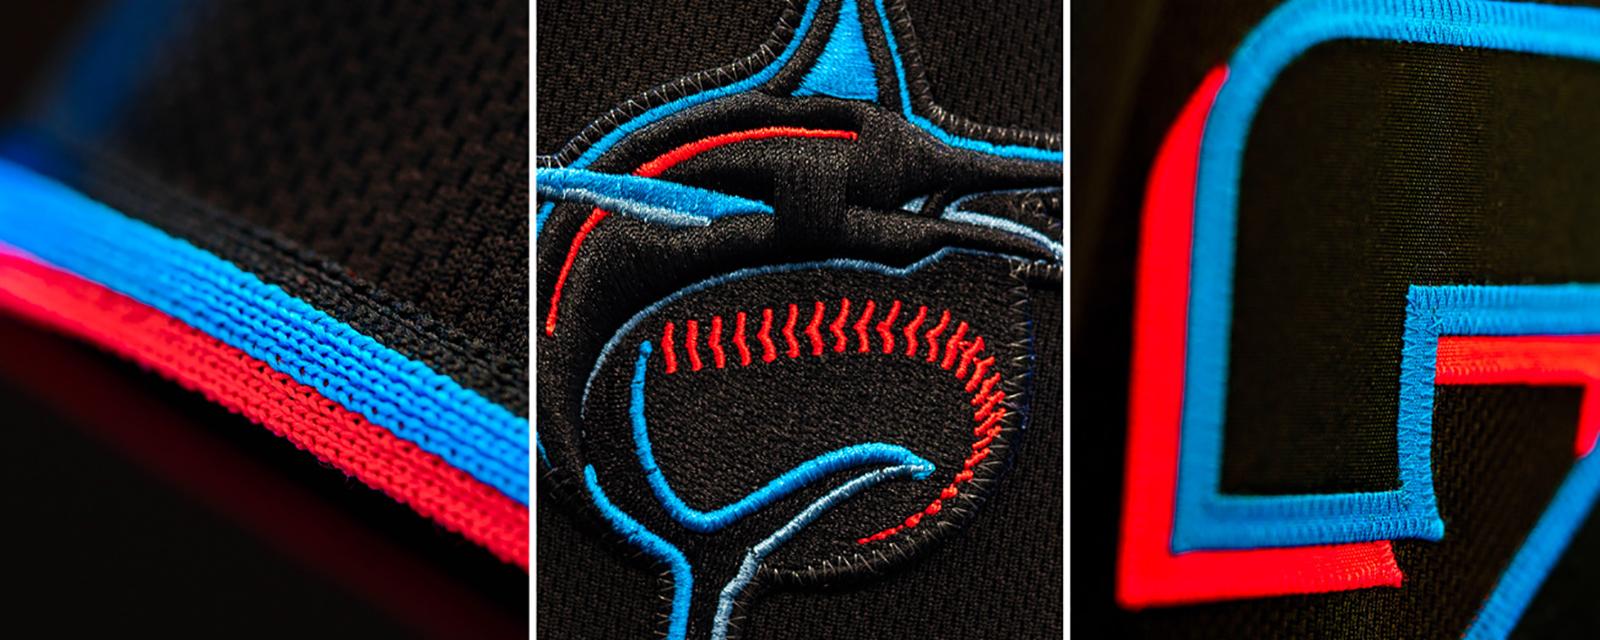 7Miami Marlins迈哈密马林鱼棒球联盟启动新LOGO-VI设计